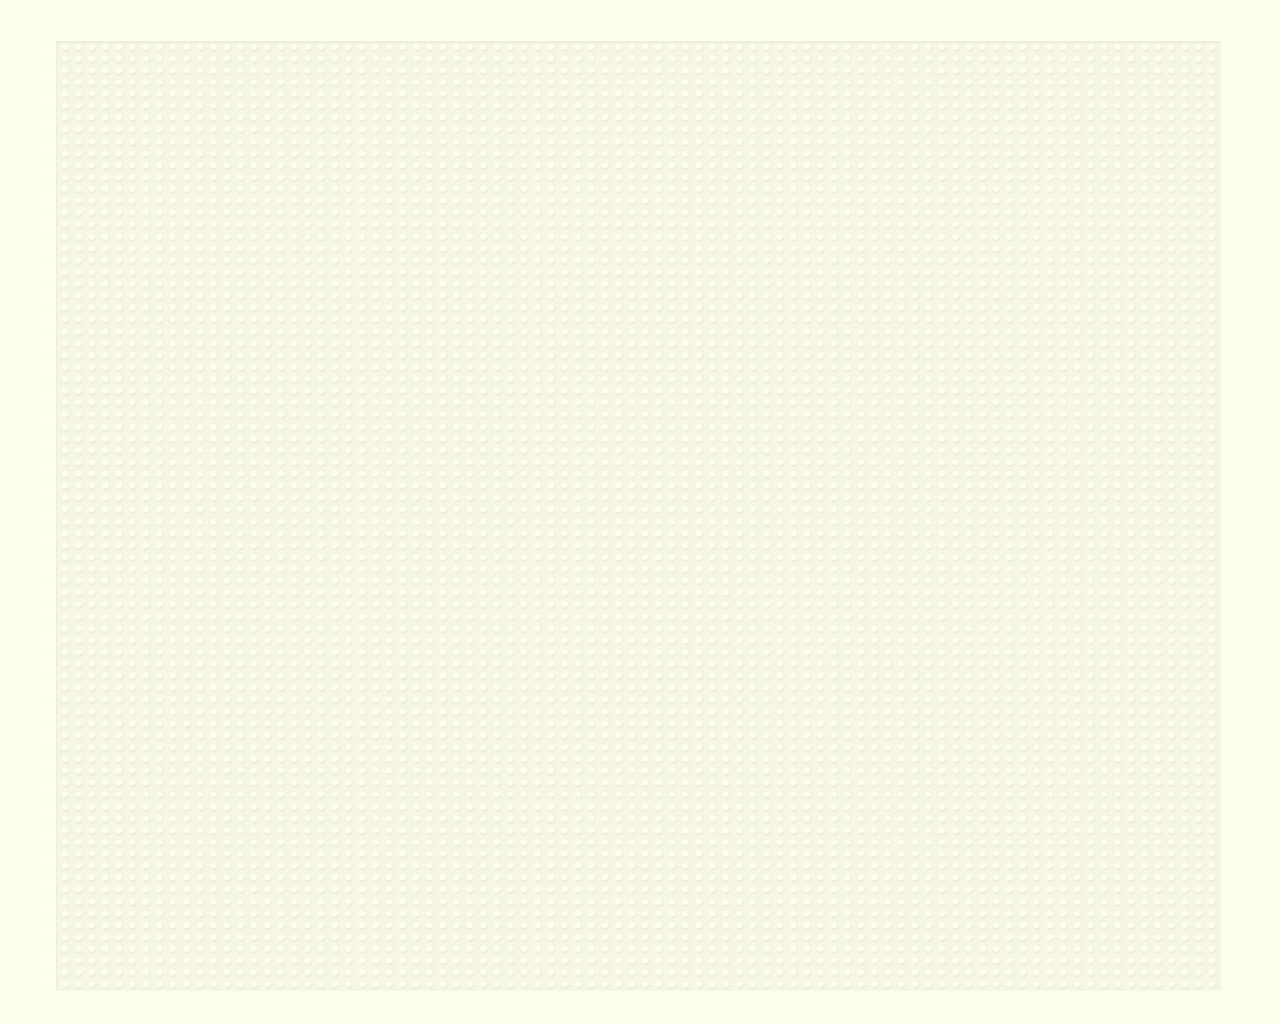 Cream And White Wallpaper Wallpapersafari